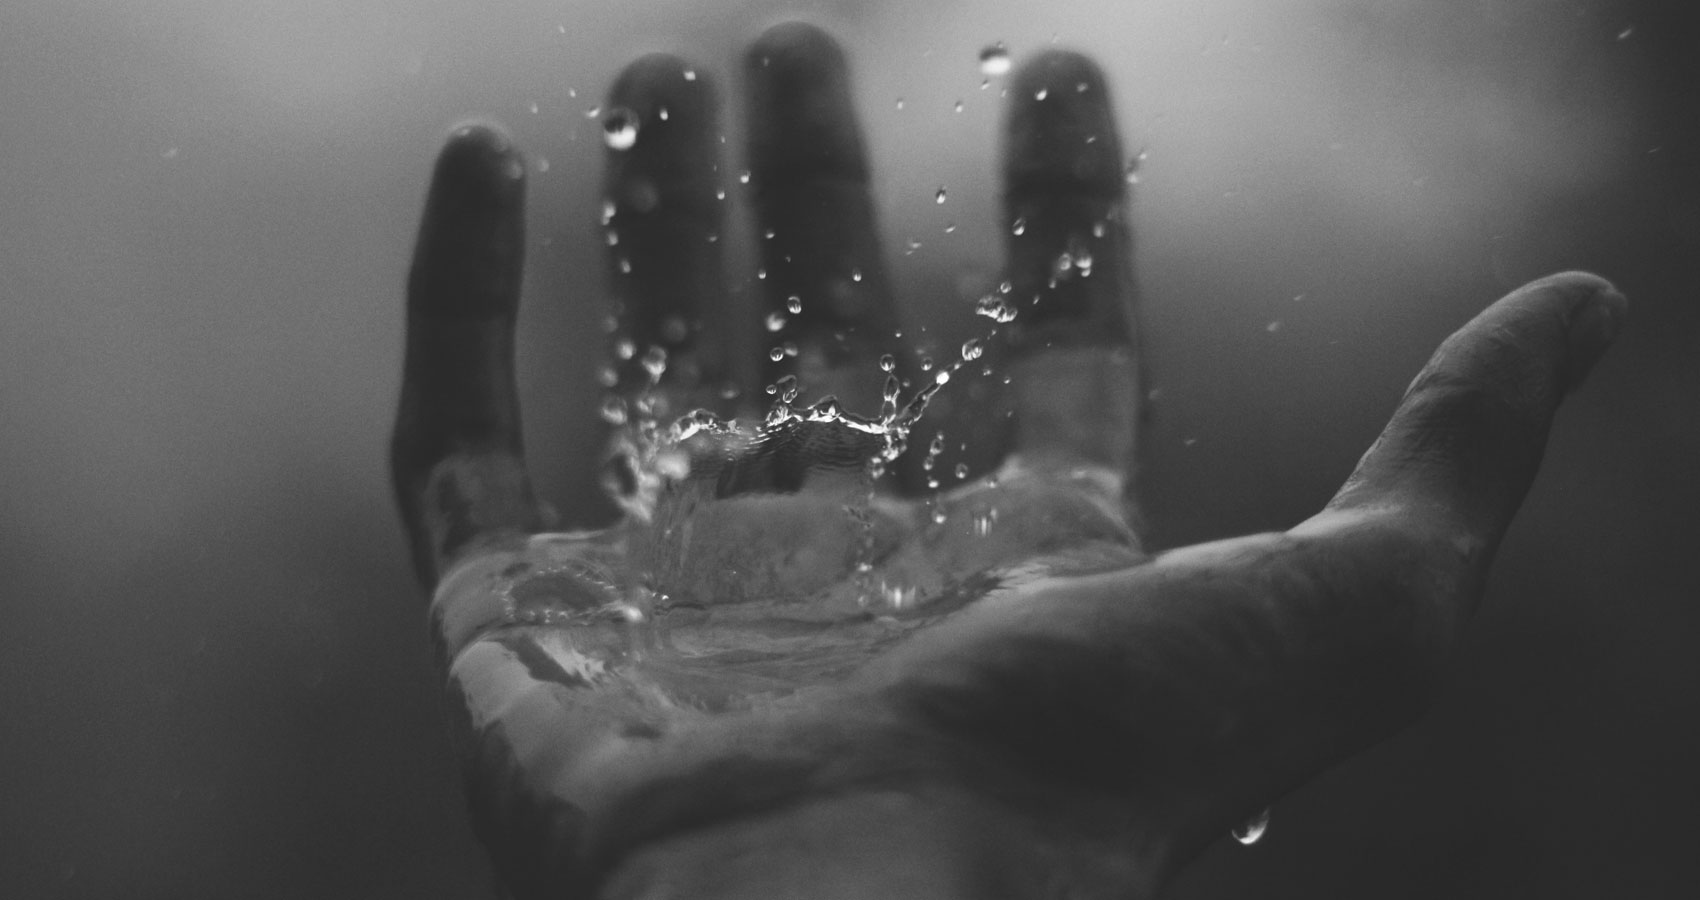 September Rain by WilliamT Fearbyat Spillwords.com